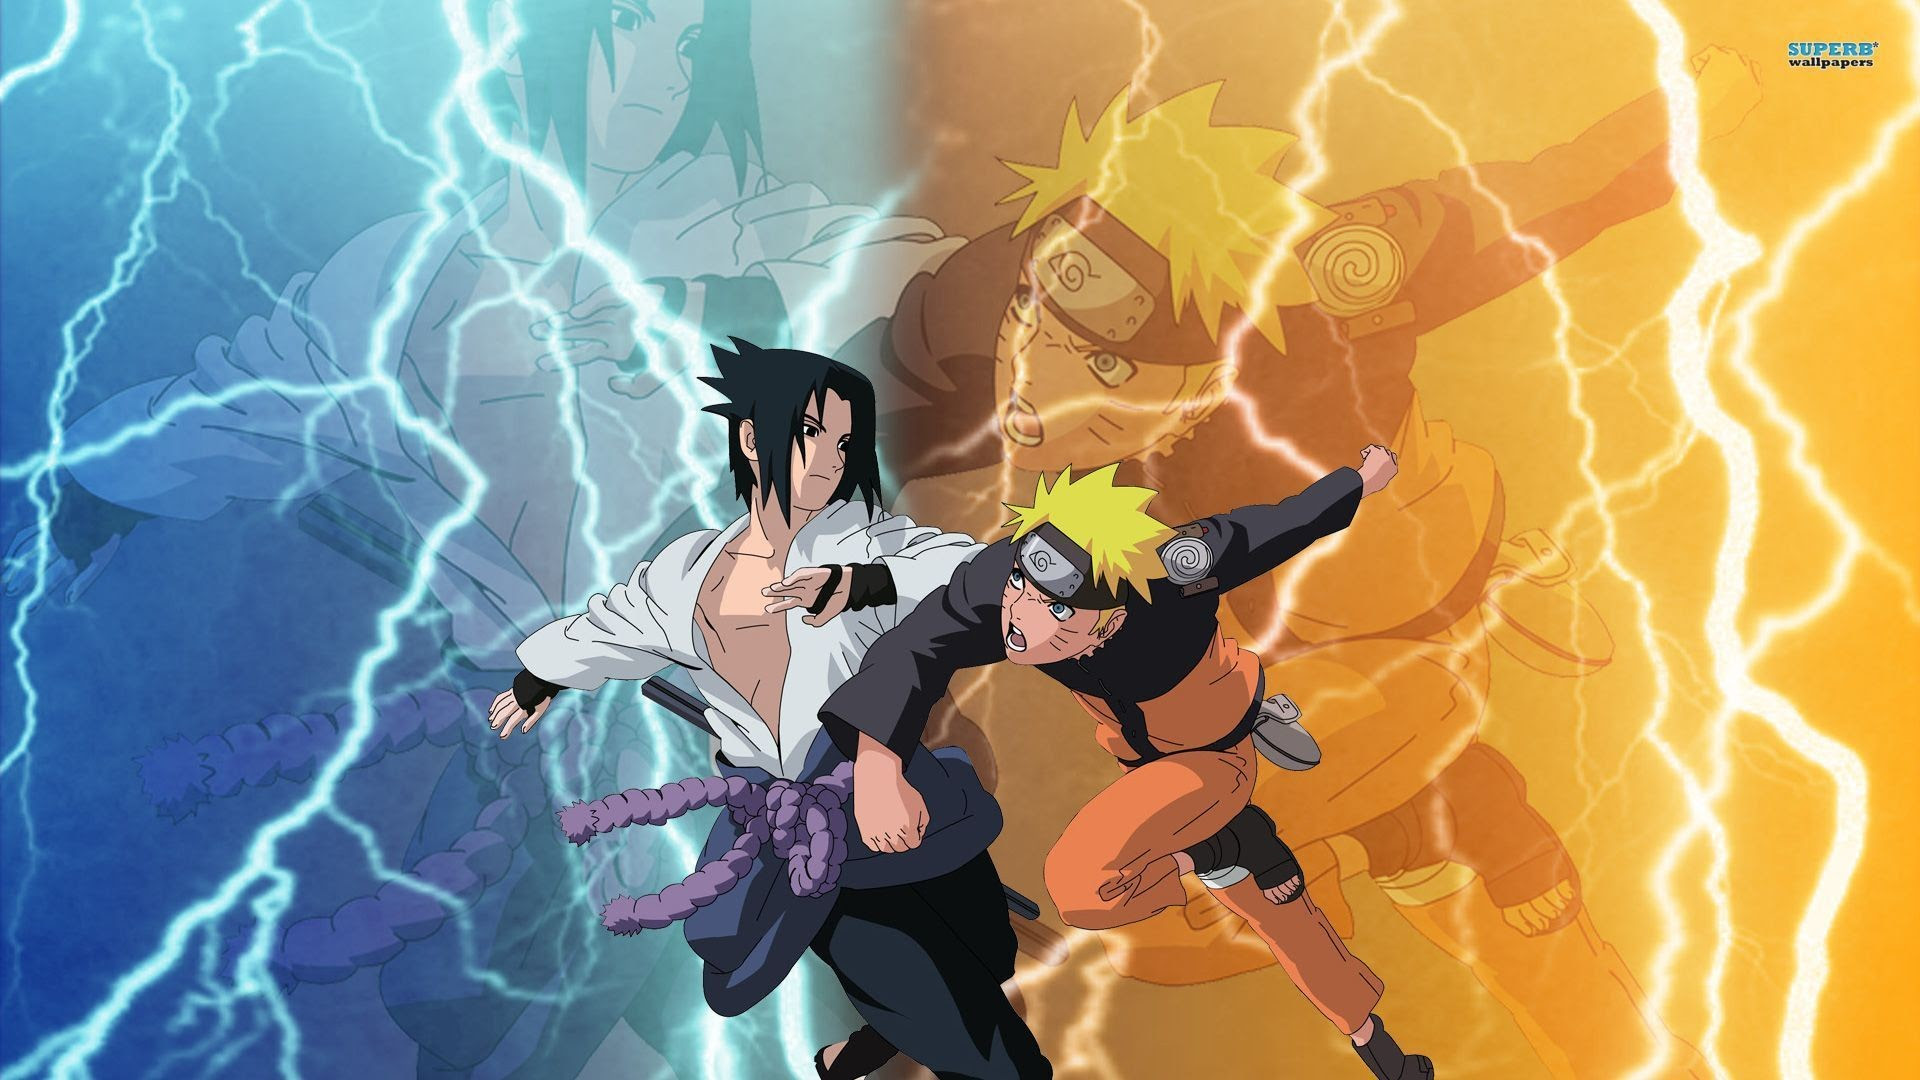 Naruto Sasuke Sakura Wallpaper (56+ images)